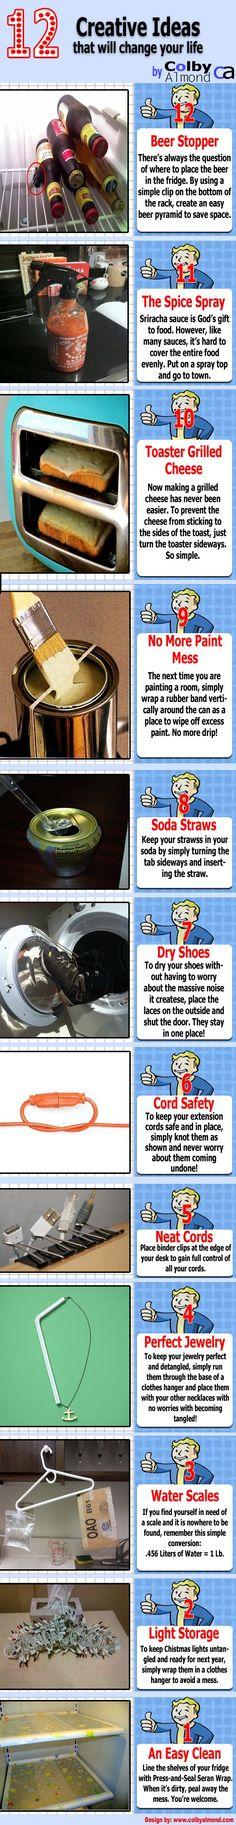 creative tips